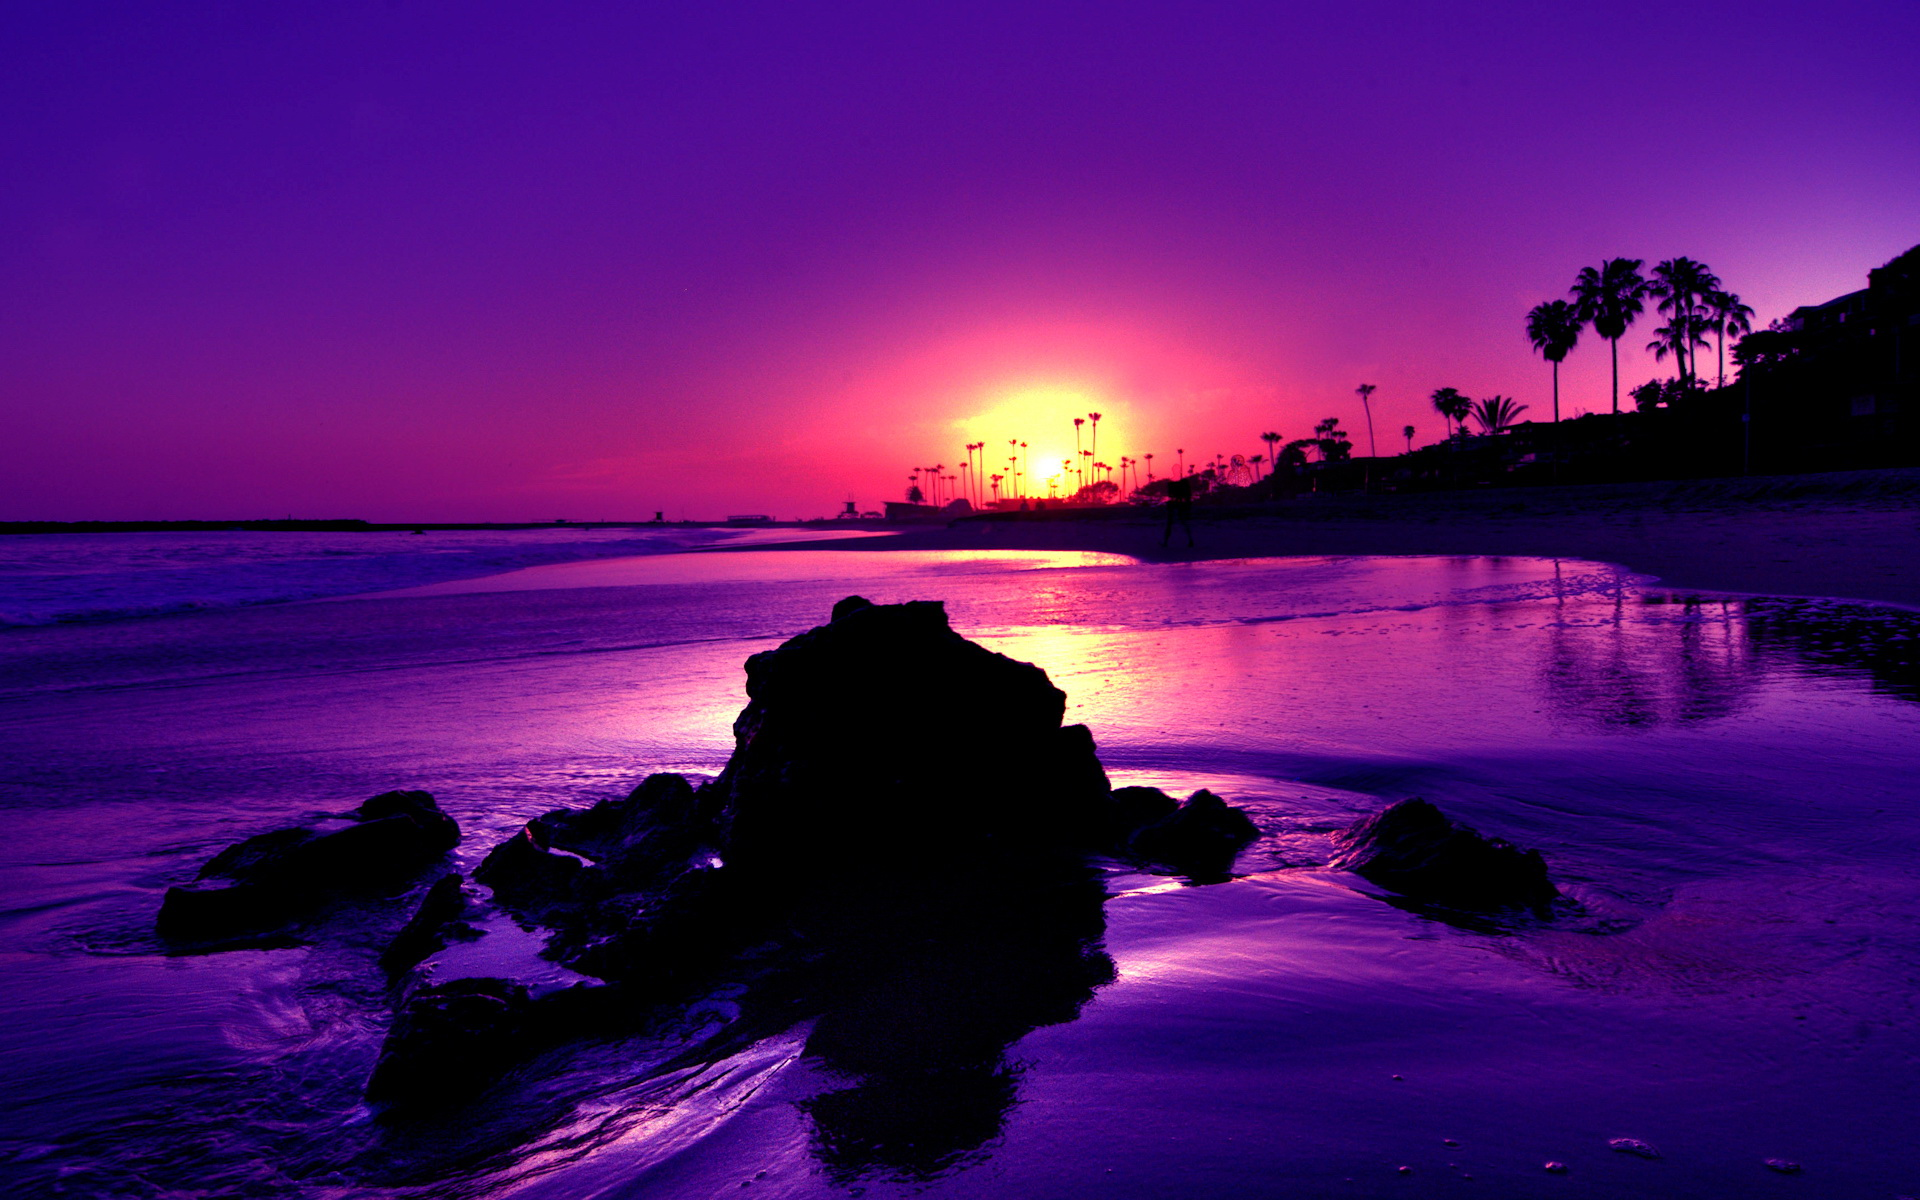 Amazing Sunset Picture